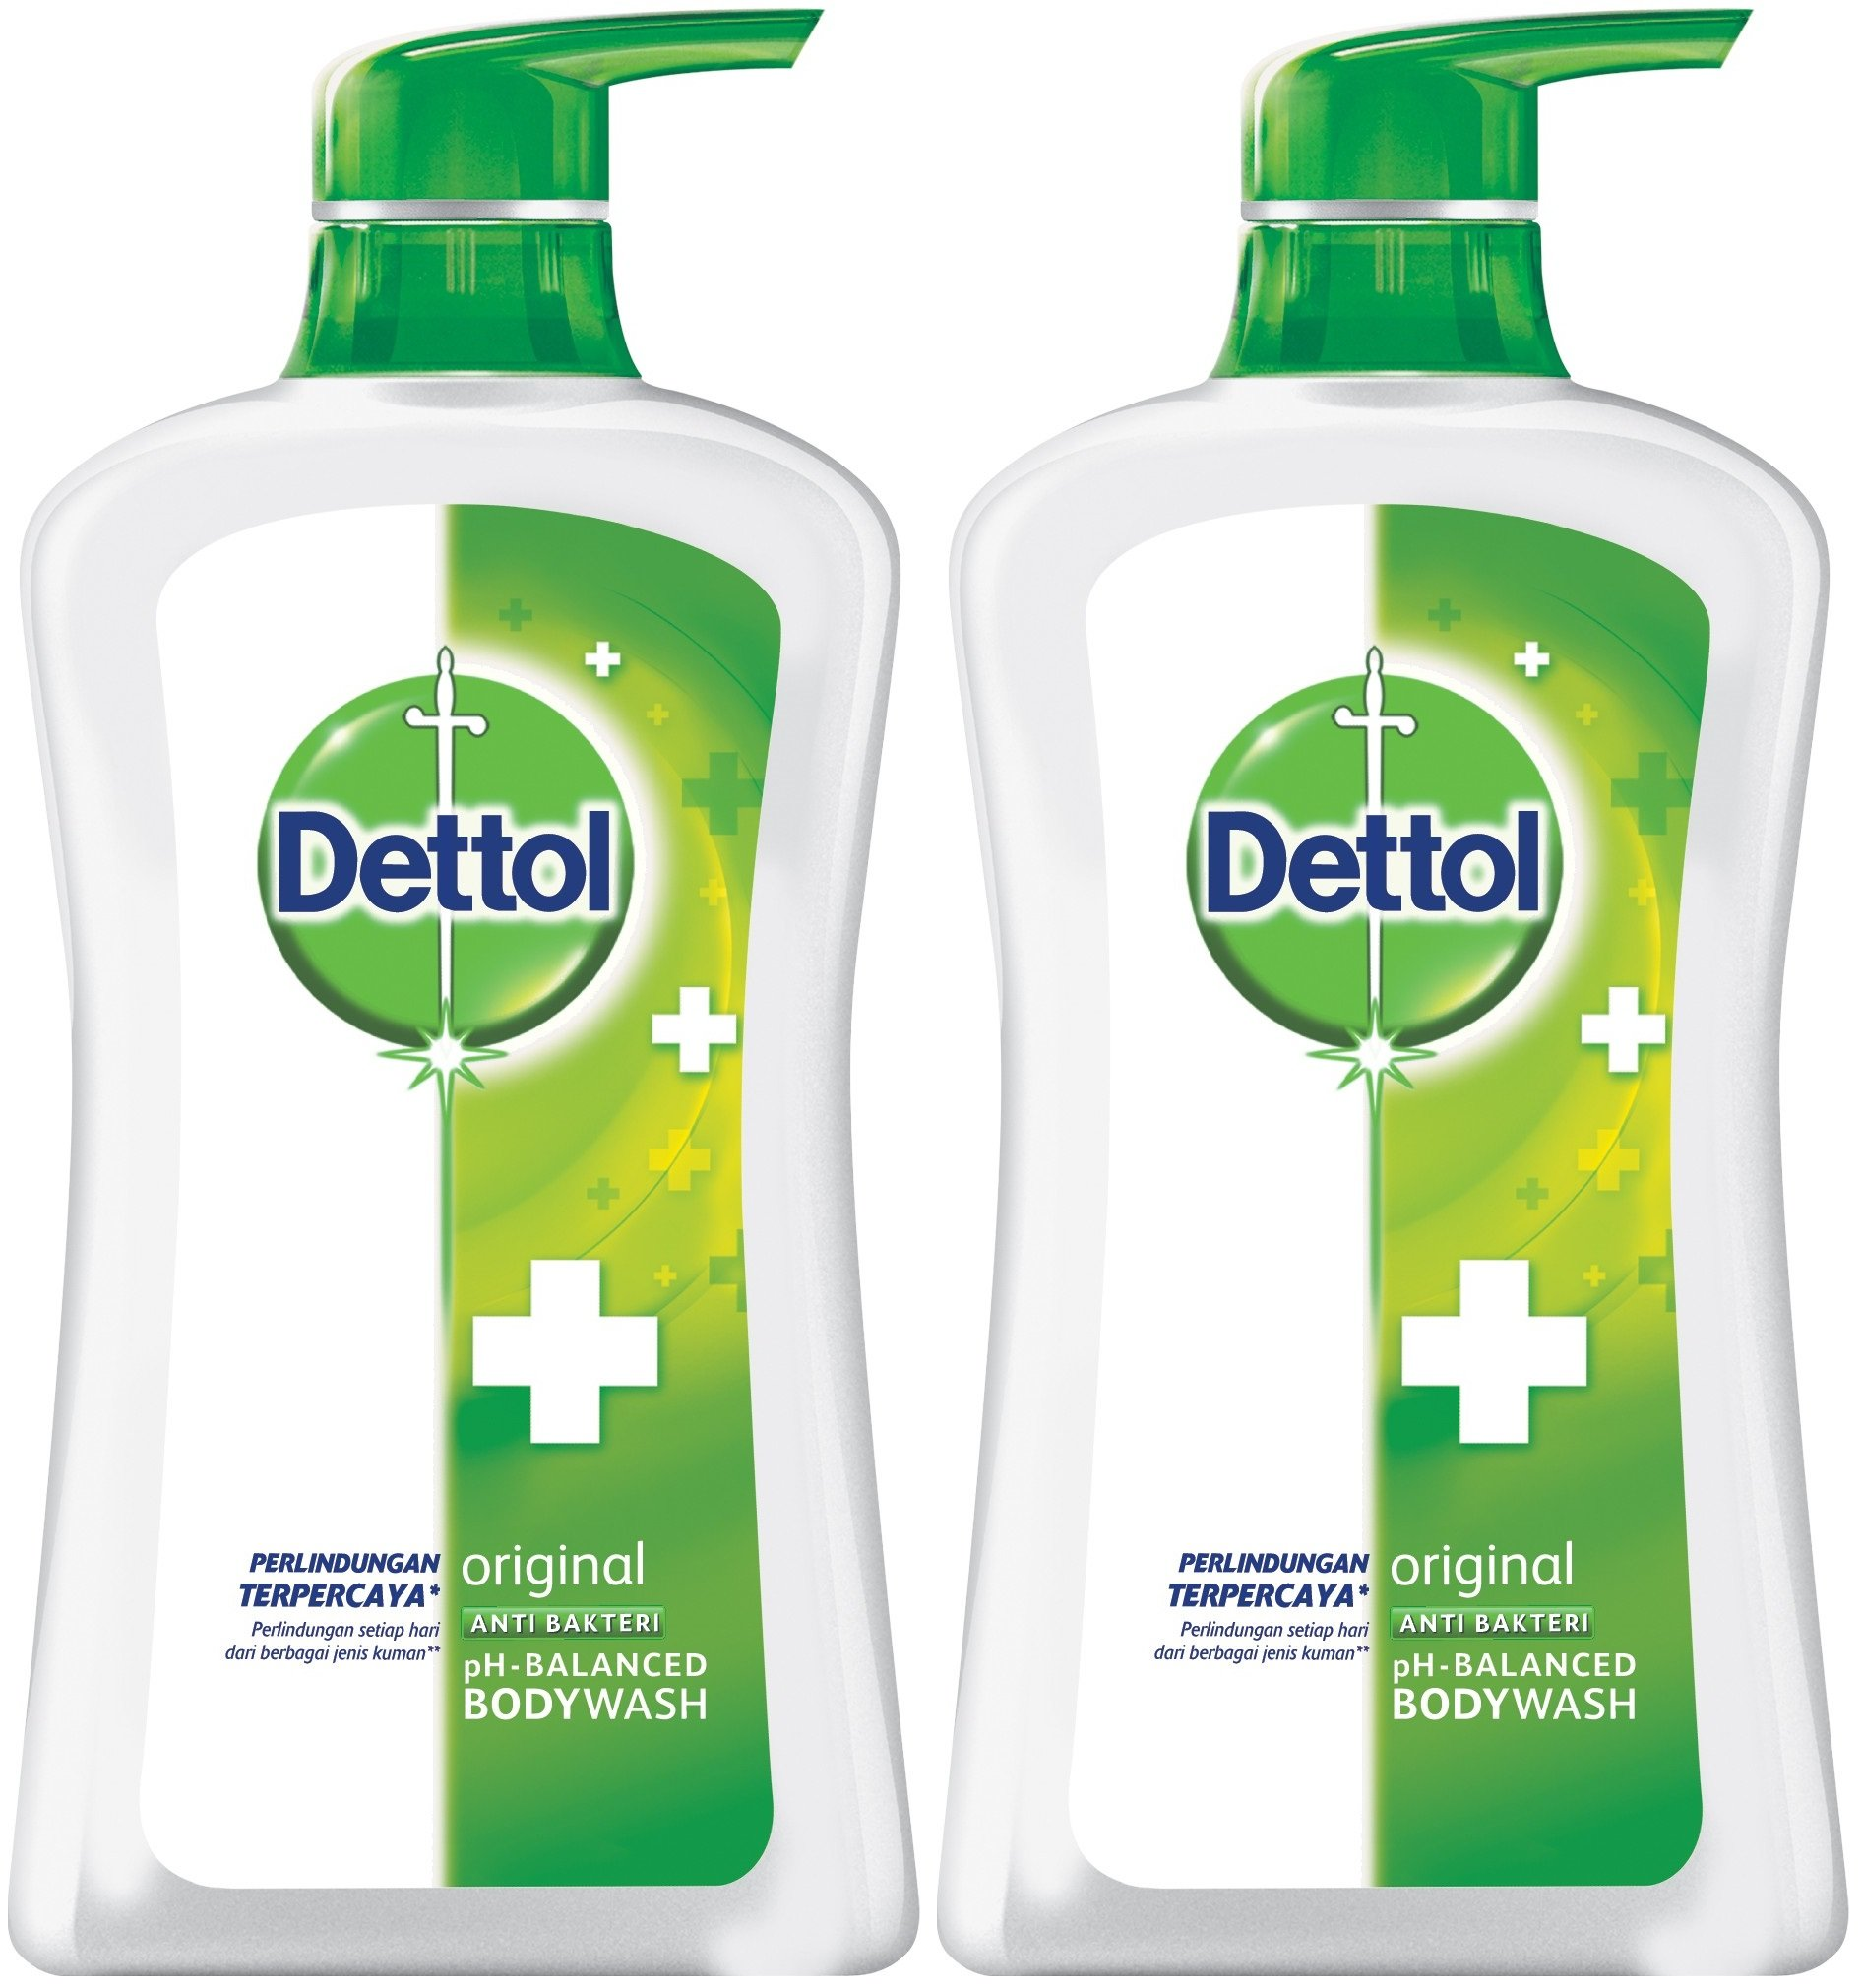 Dettol Topical Antiseptic Liquid 2535 Floz750ml 100 Ml Anti Bacterial Ph Balanced Body Wash Original 211 Oz 625